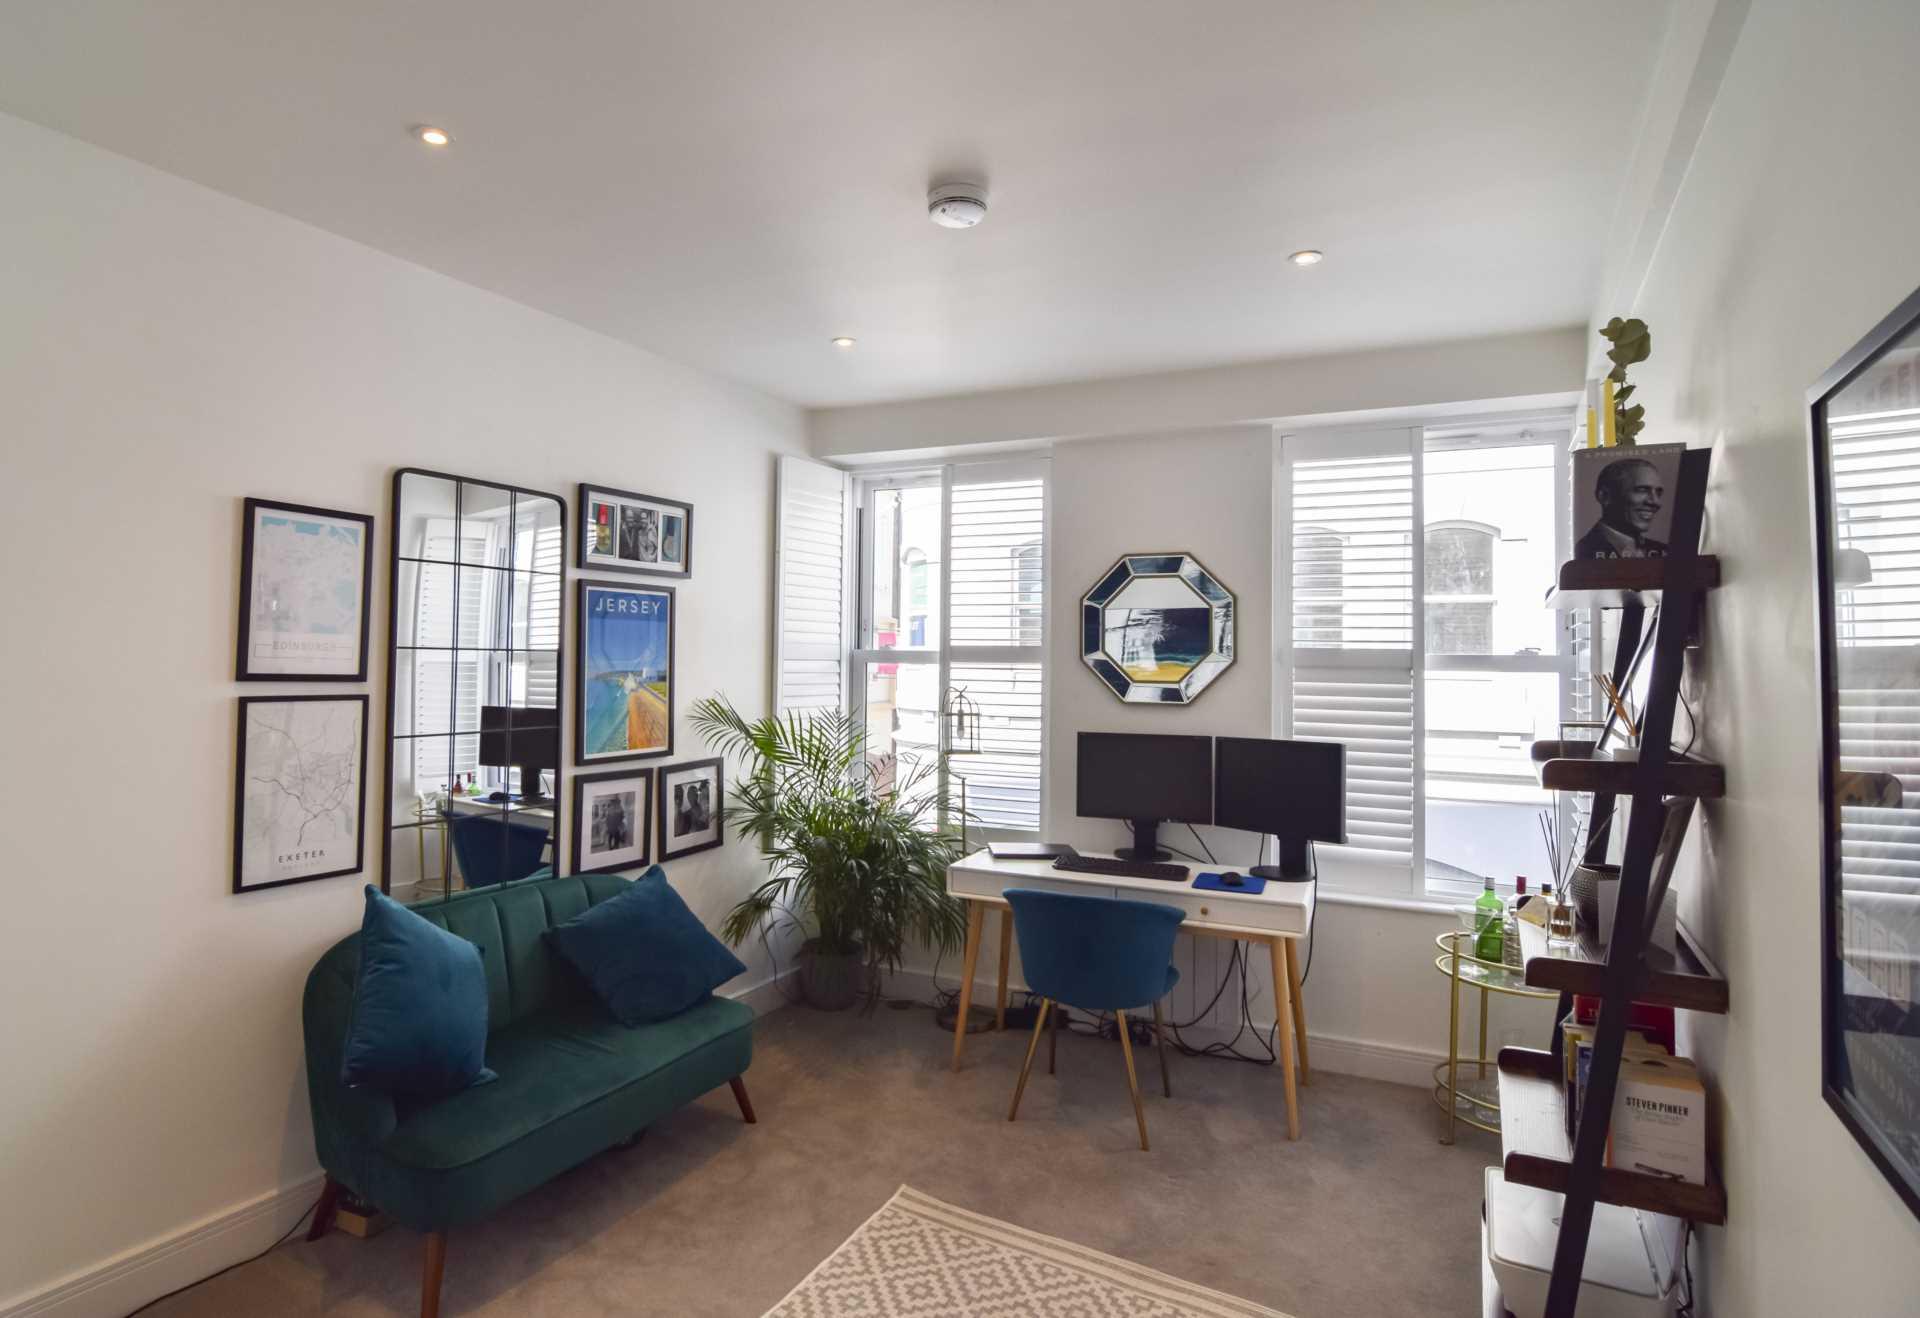 Flat 6, Waterloo Apartments, Image 13